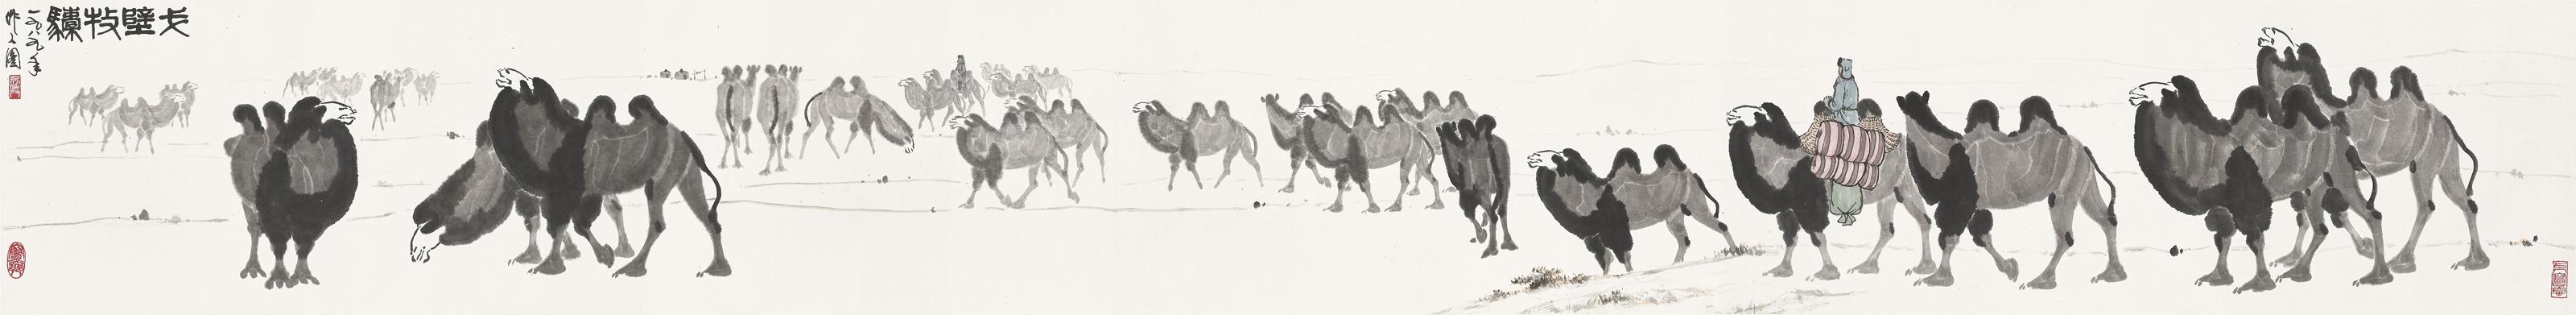 Travelling Camels